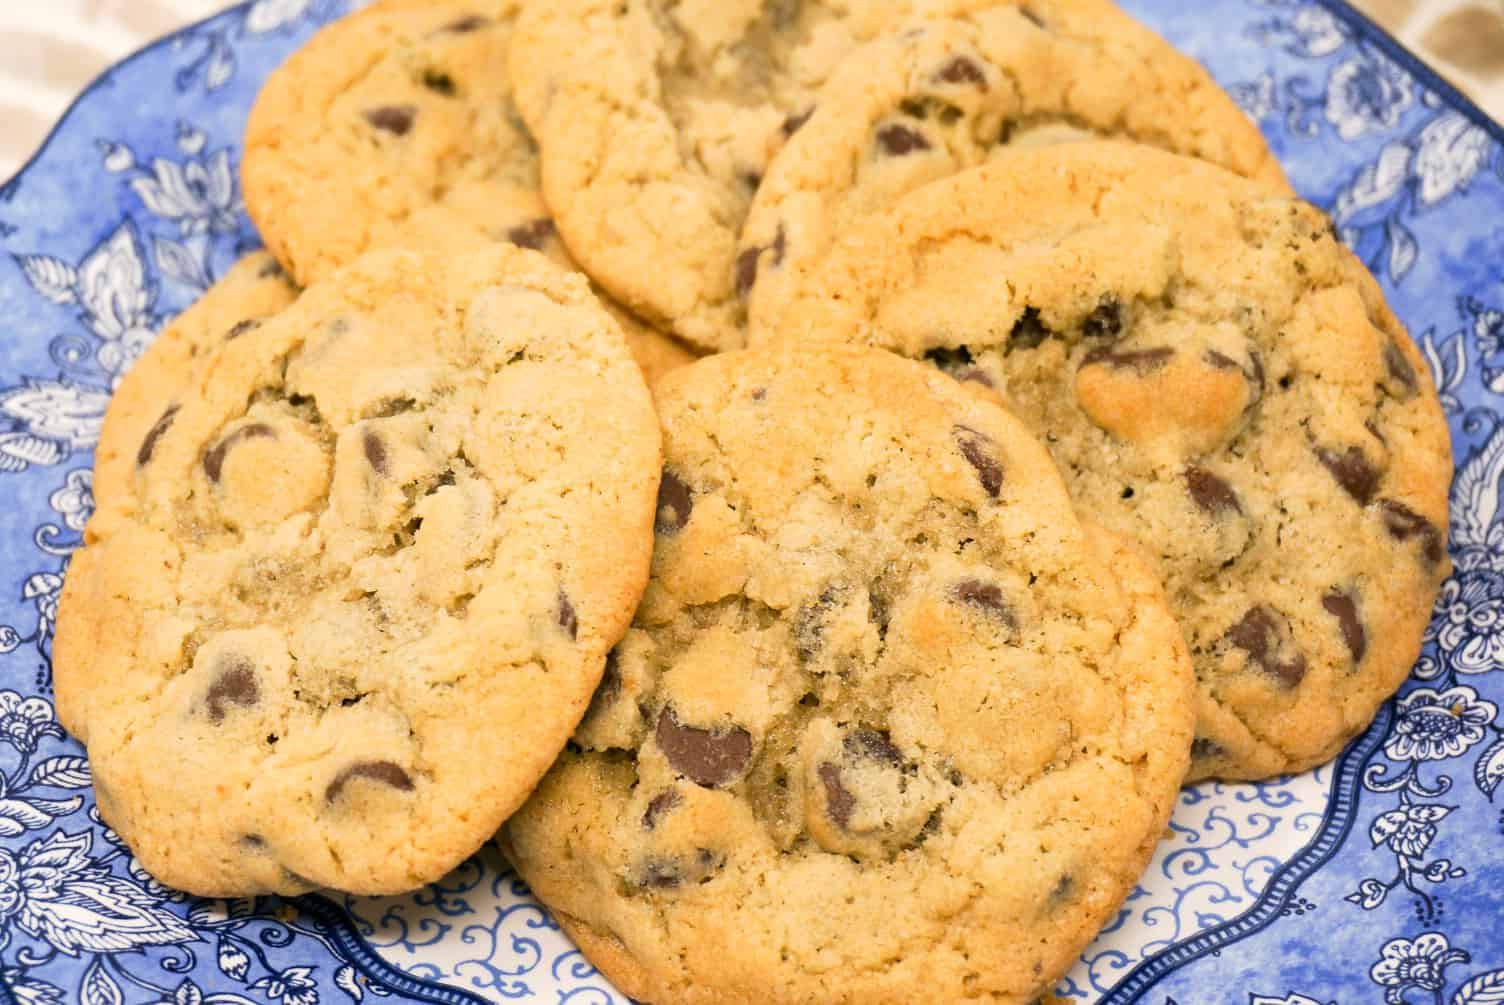 Rainy Day Chocolate Chip Cookies